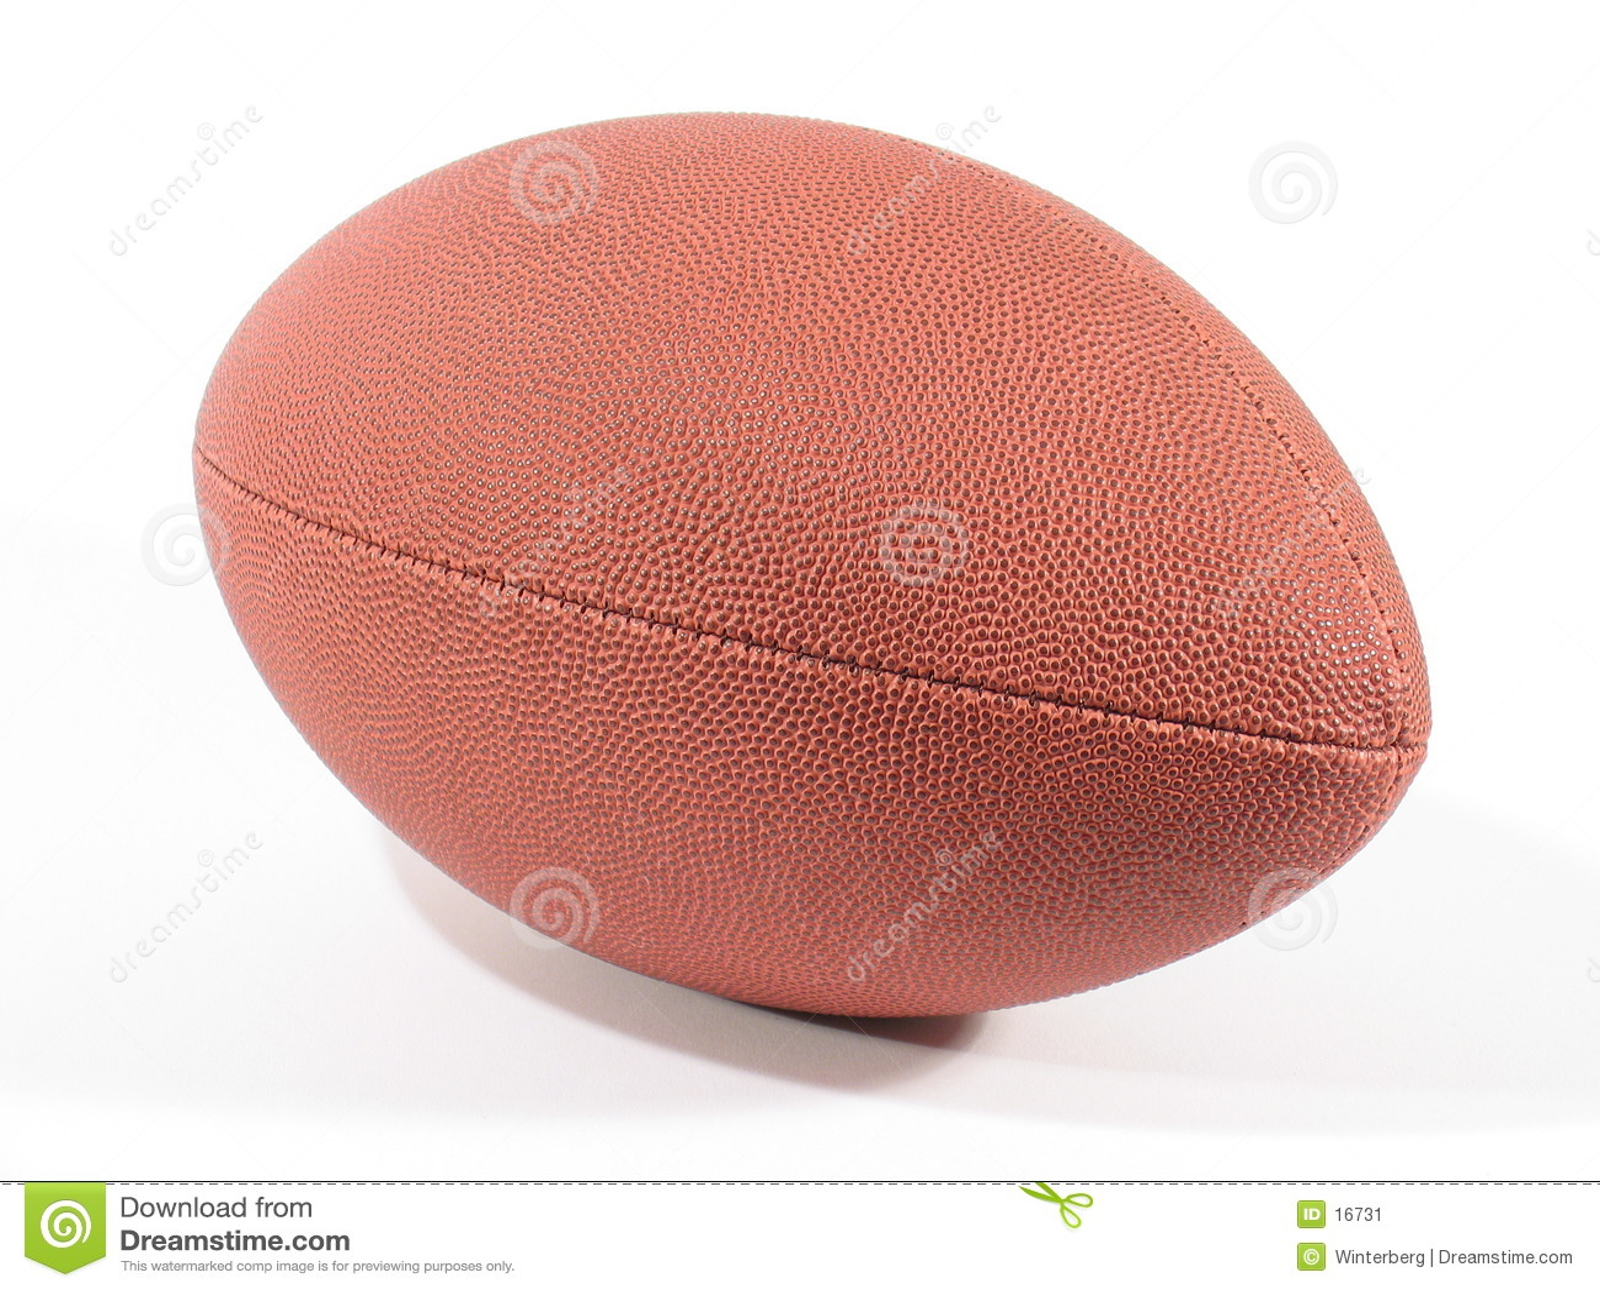 Football amerykański iv